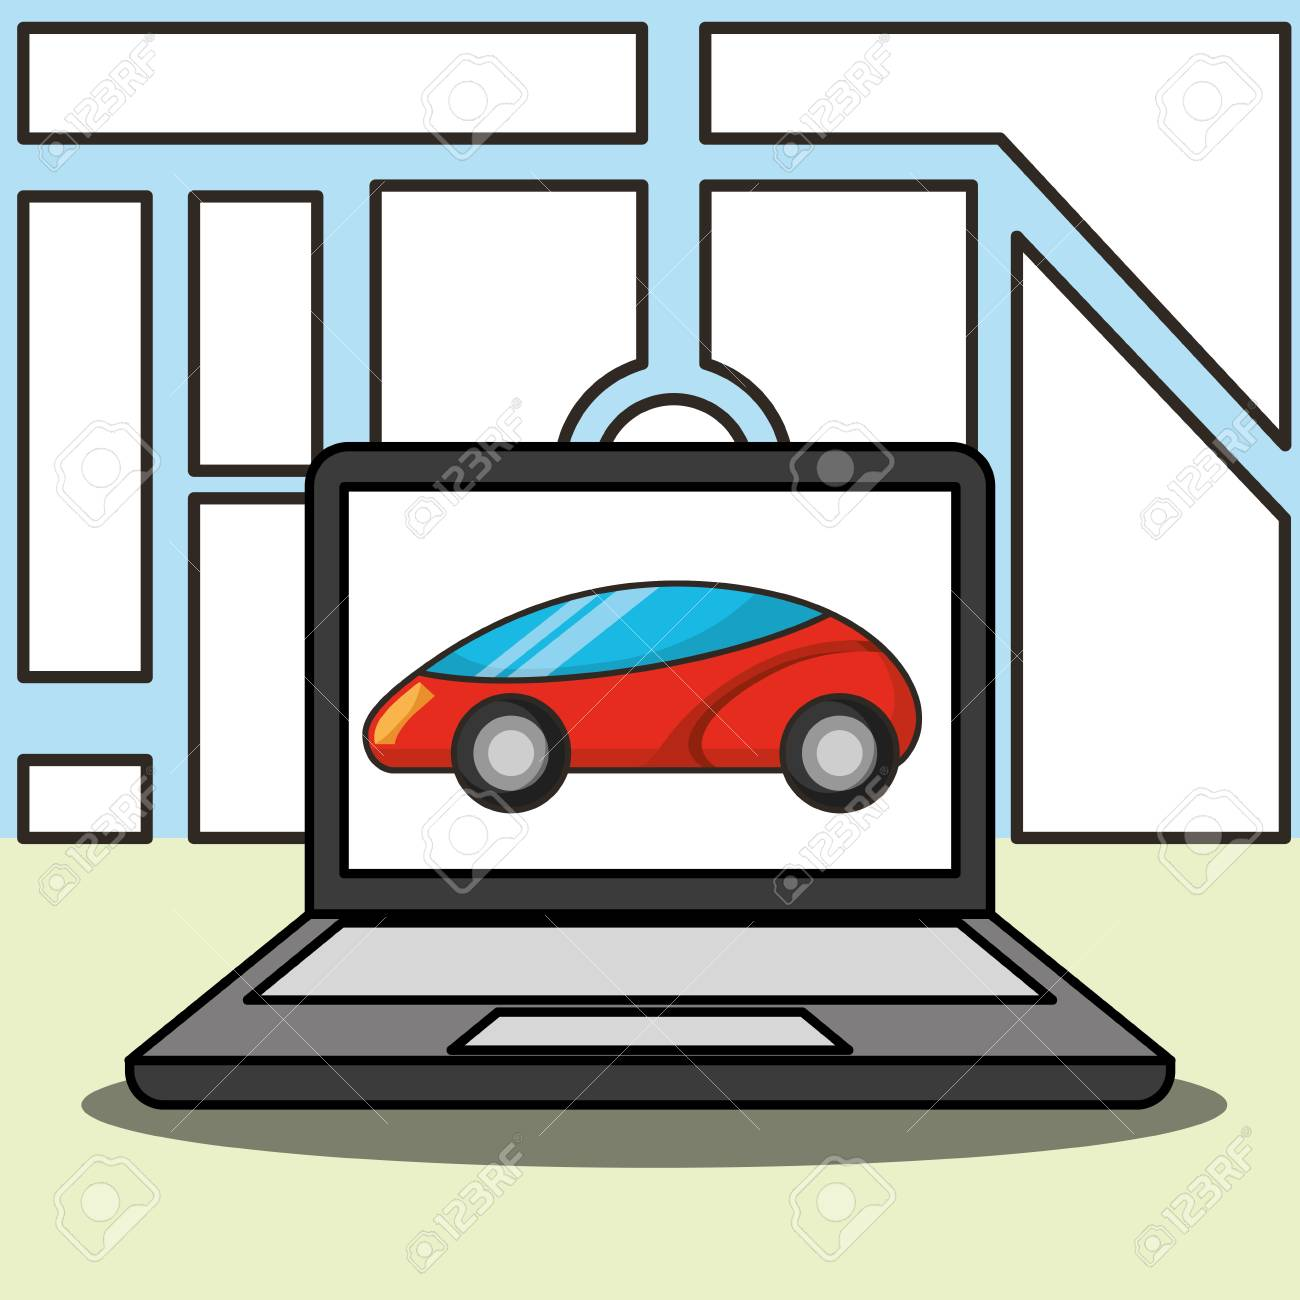 autonomous car computer screen ubication vector illustration - 111614482